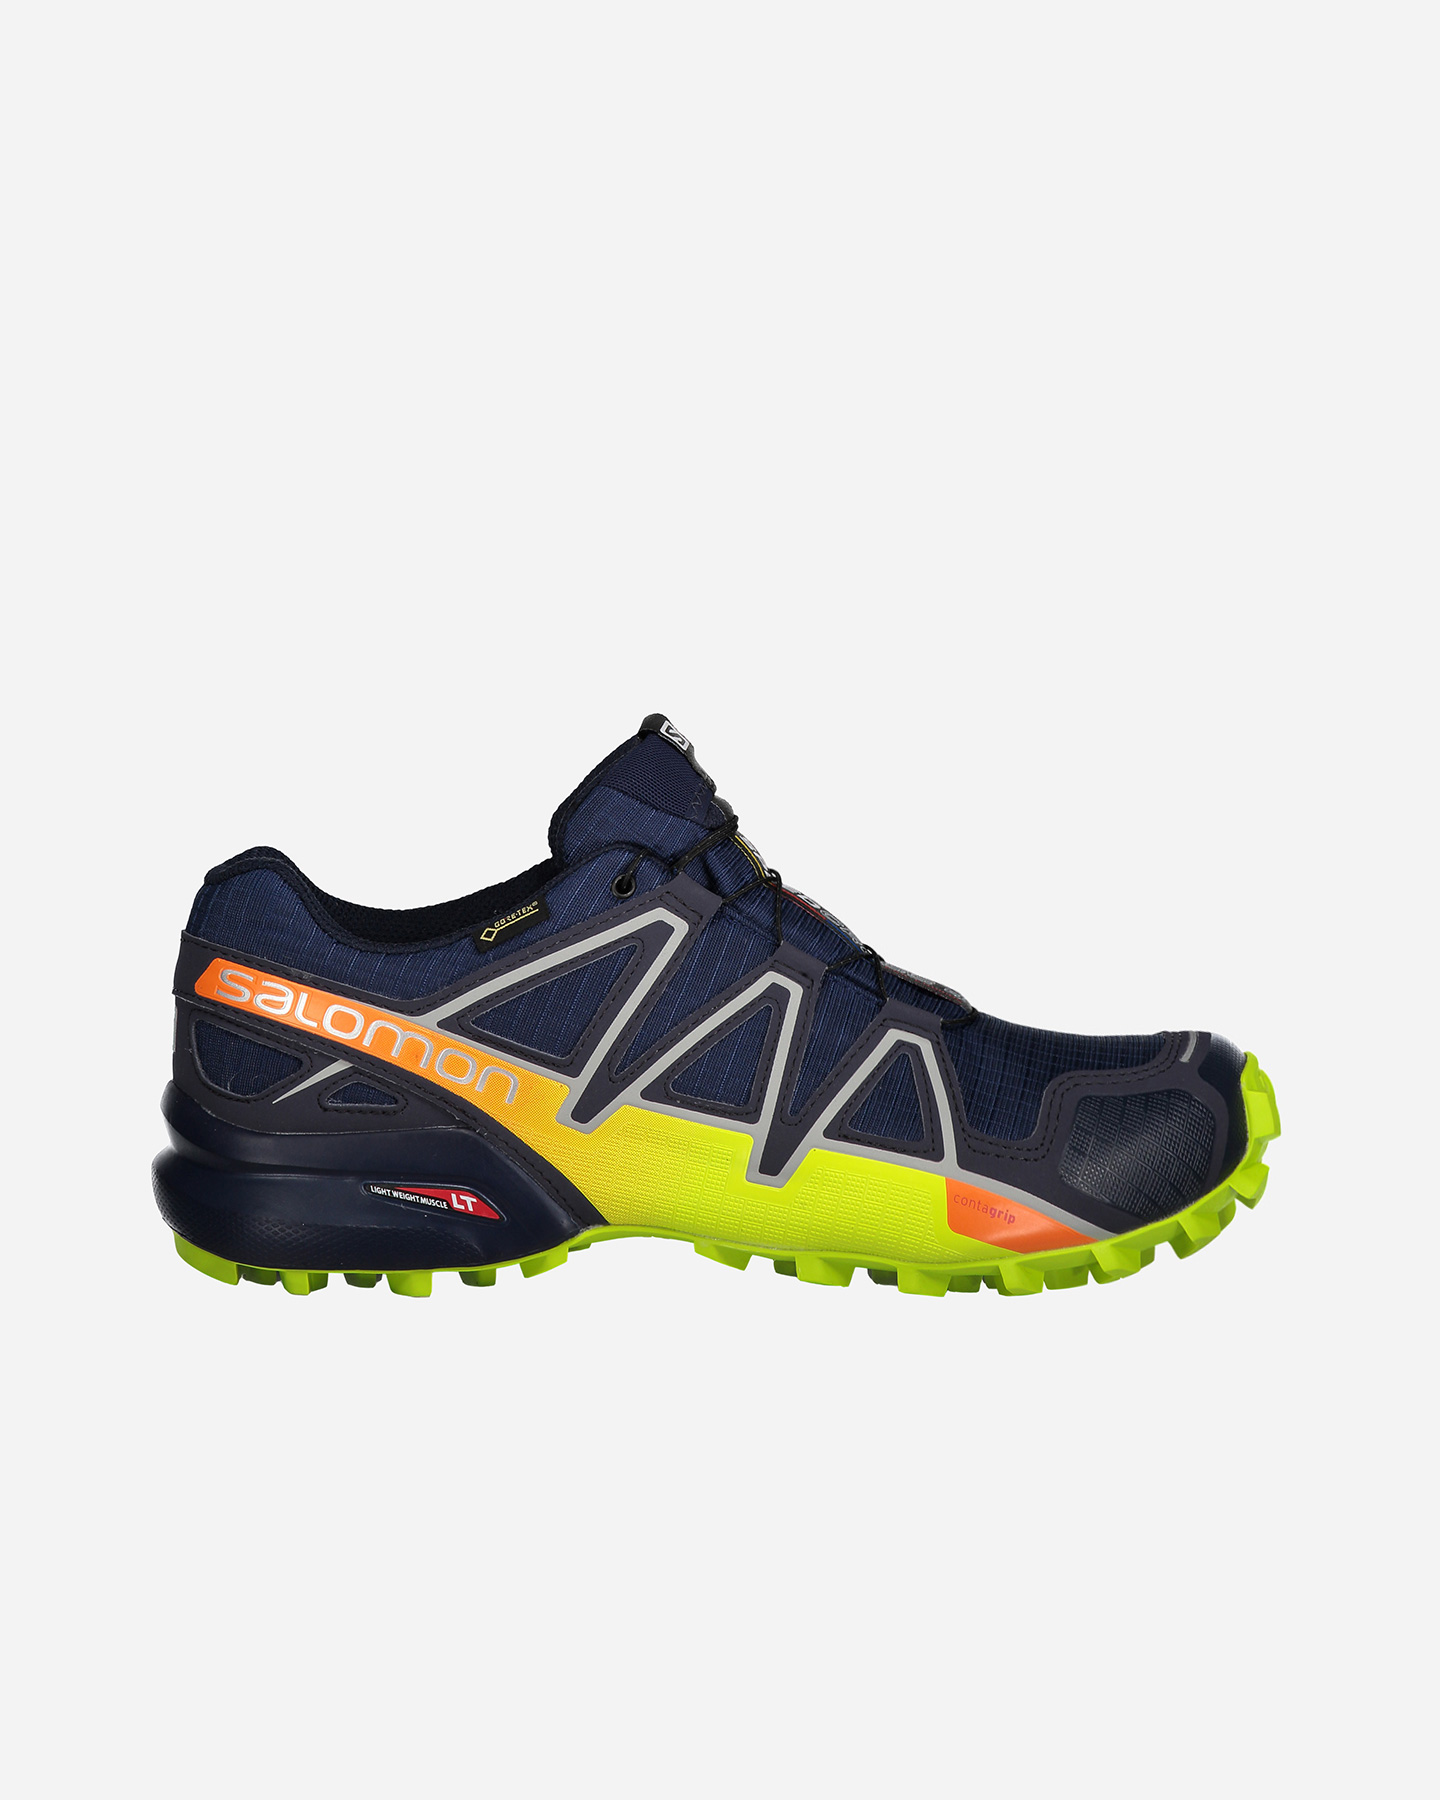 M Sport Cisalfa Gtx Trail Su L40093800 4 Salomon Scarpe Speedcross 1aAzvPWt 26bf9e18d58